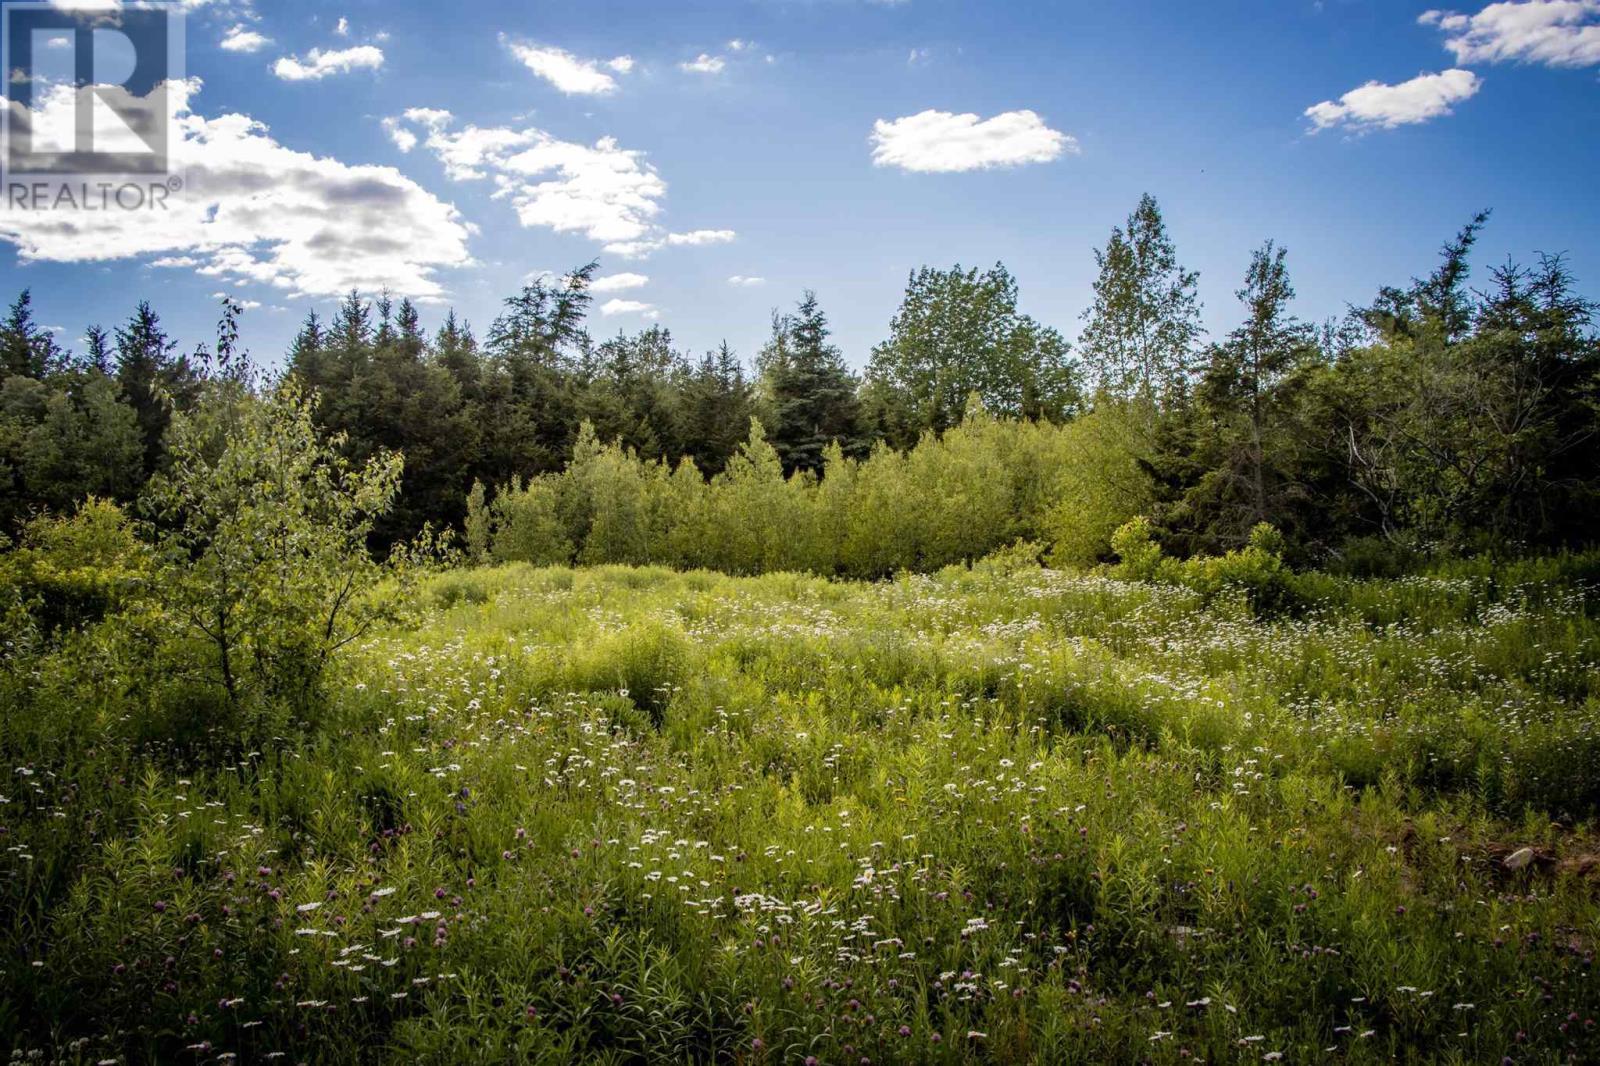 Lot A6 Aylesford Road, Lake Paul, Nova Scotia  B0P 1C0 - Photo 1 - 202115394